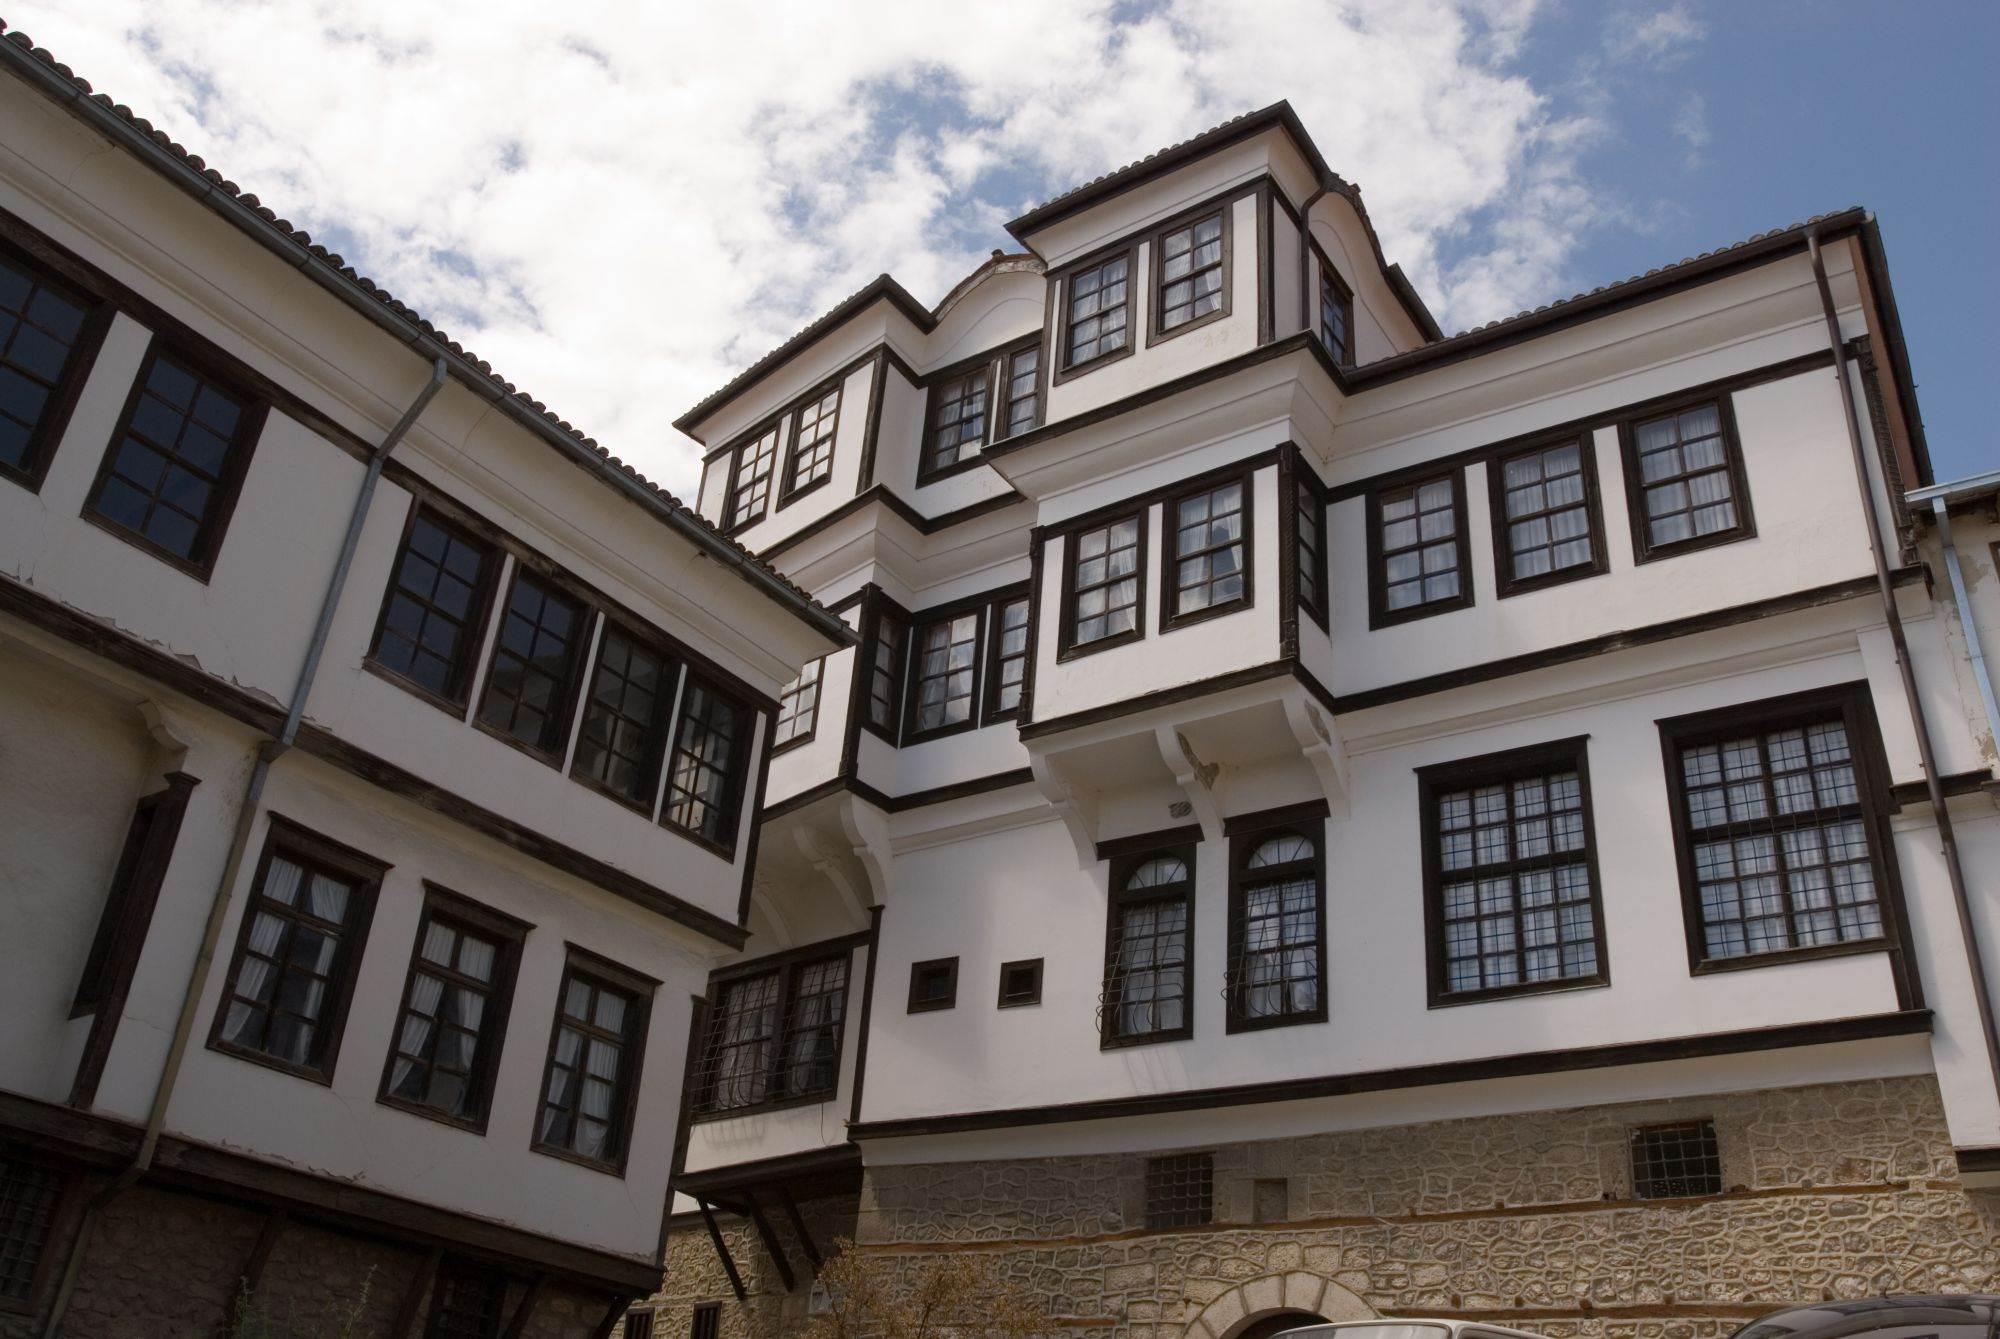 Kuća Robevih, Ohrid